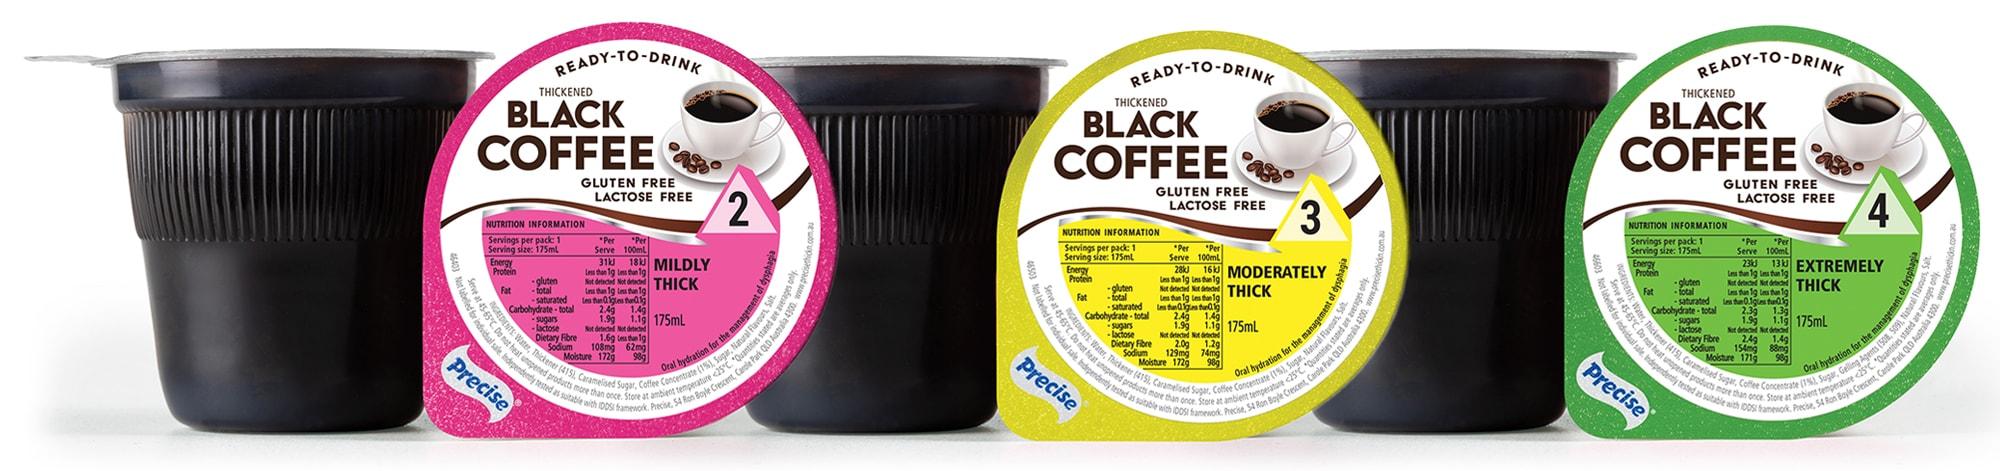 RTD Black Coffee